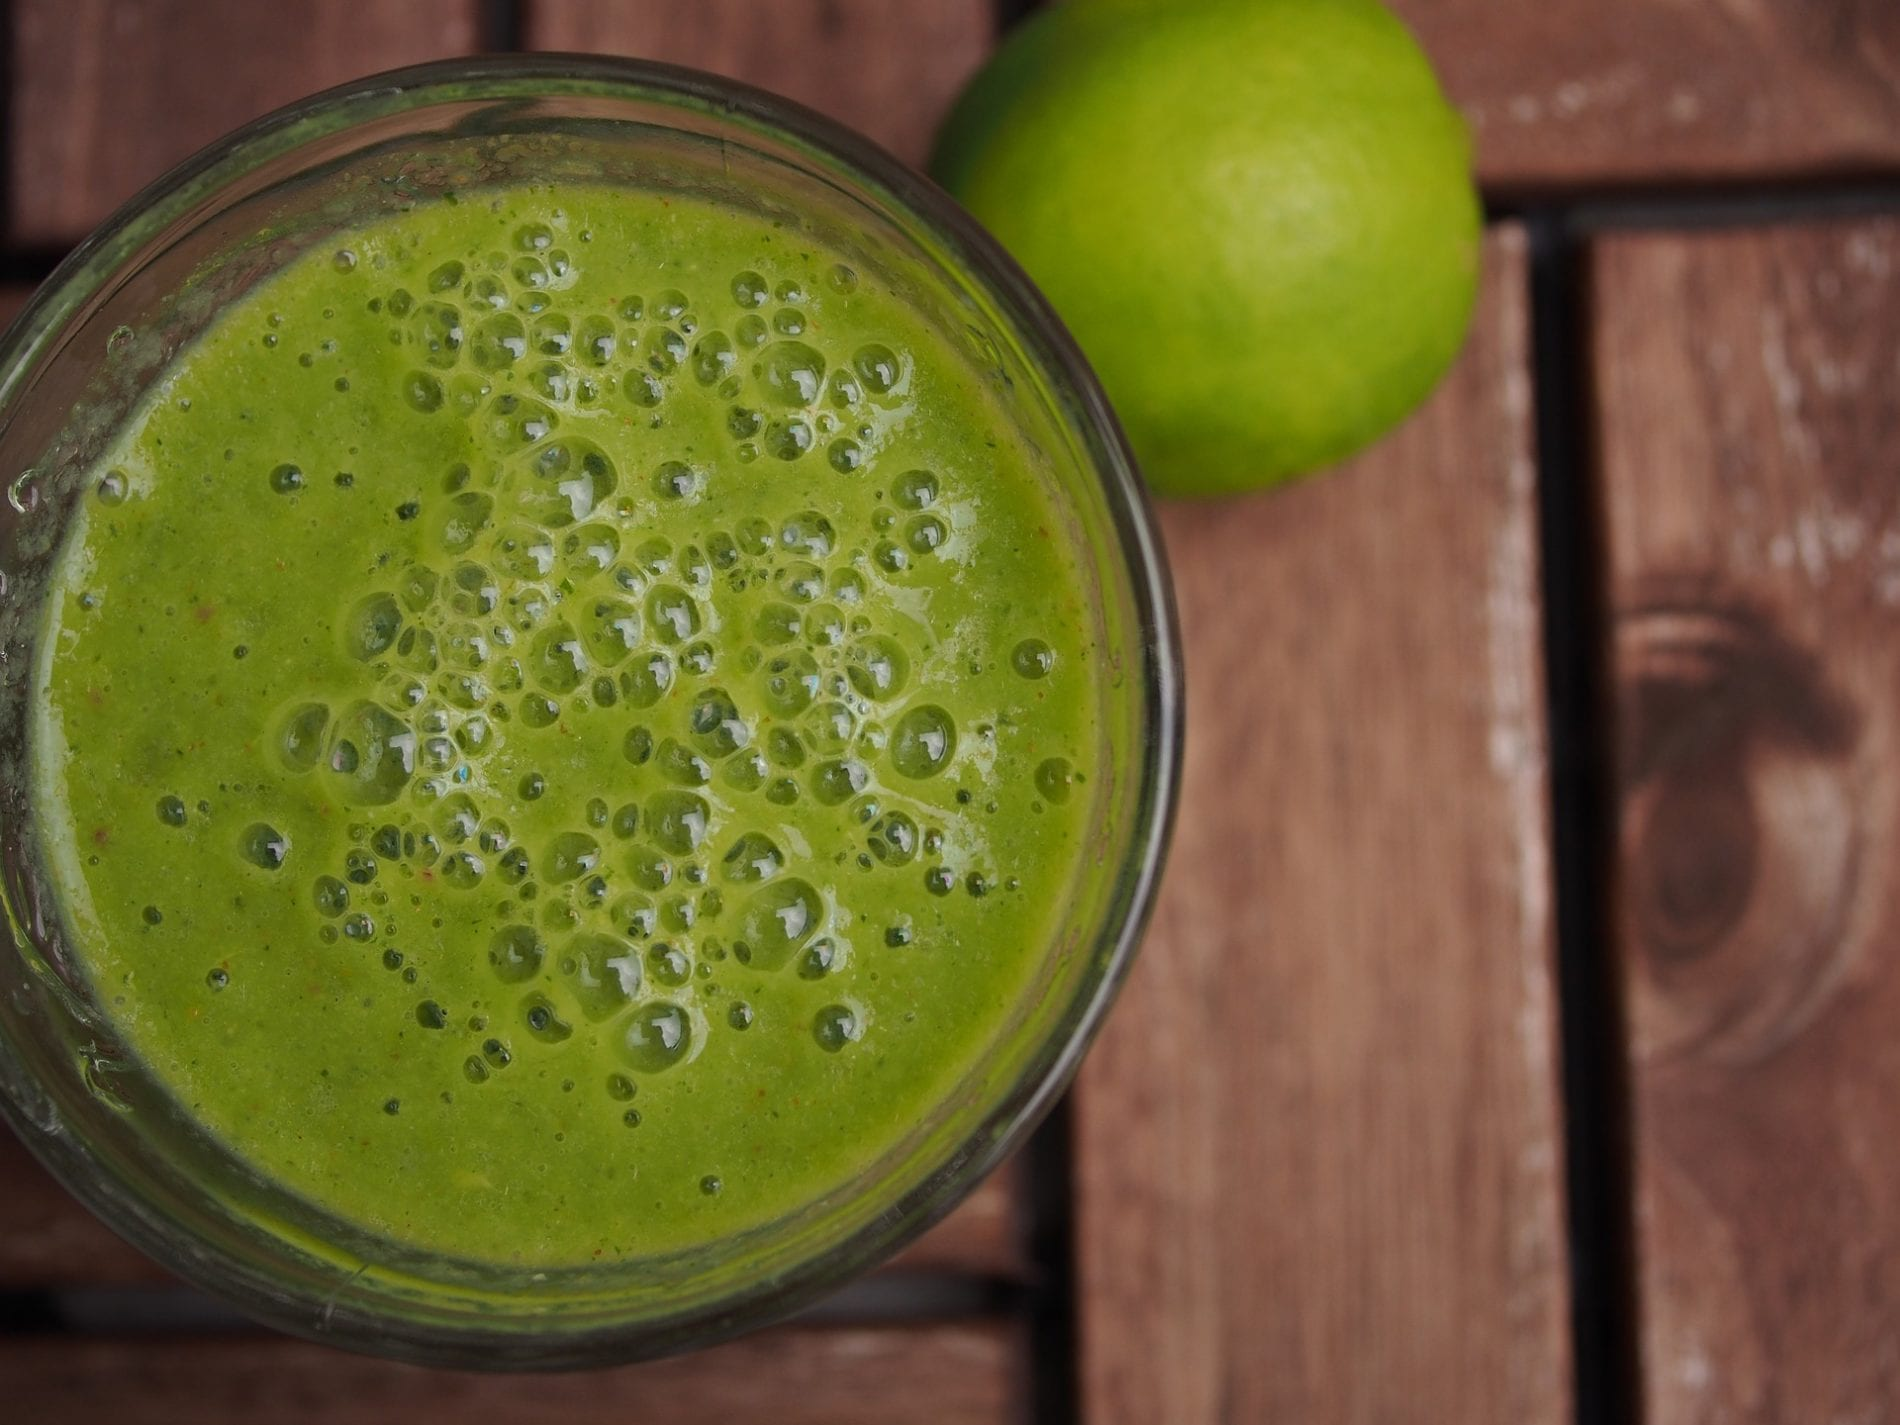 green green juice